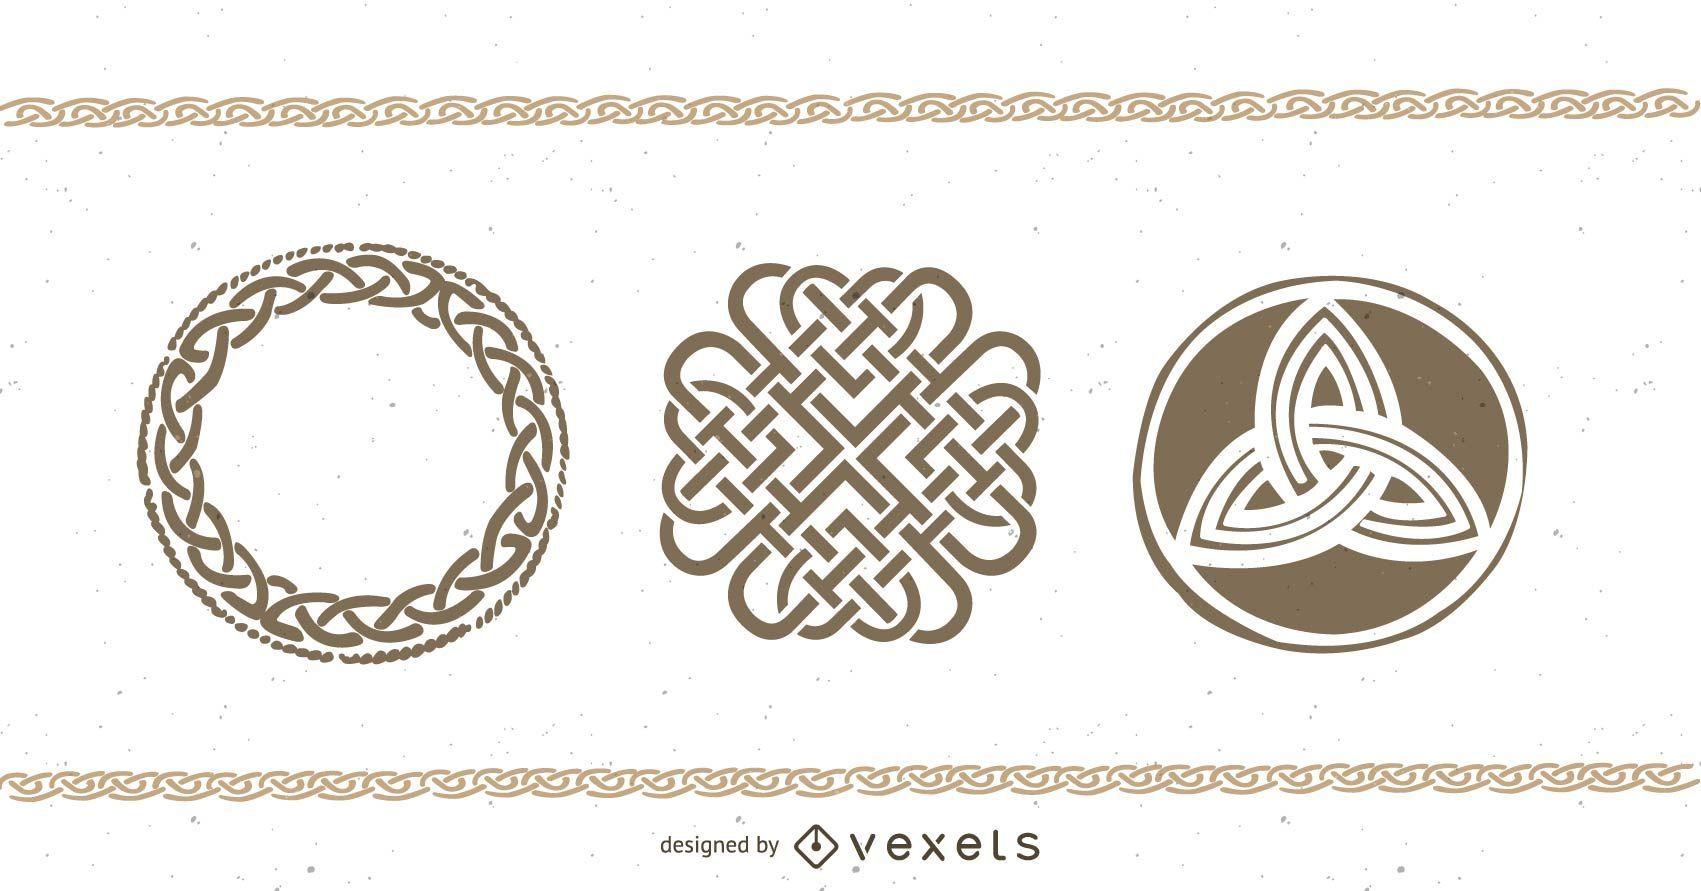 Alguns designs de tatuagem celta